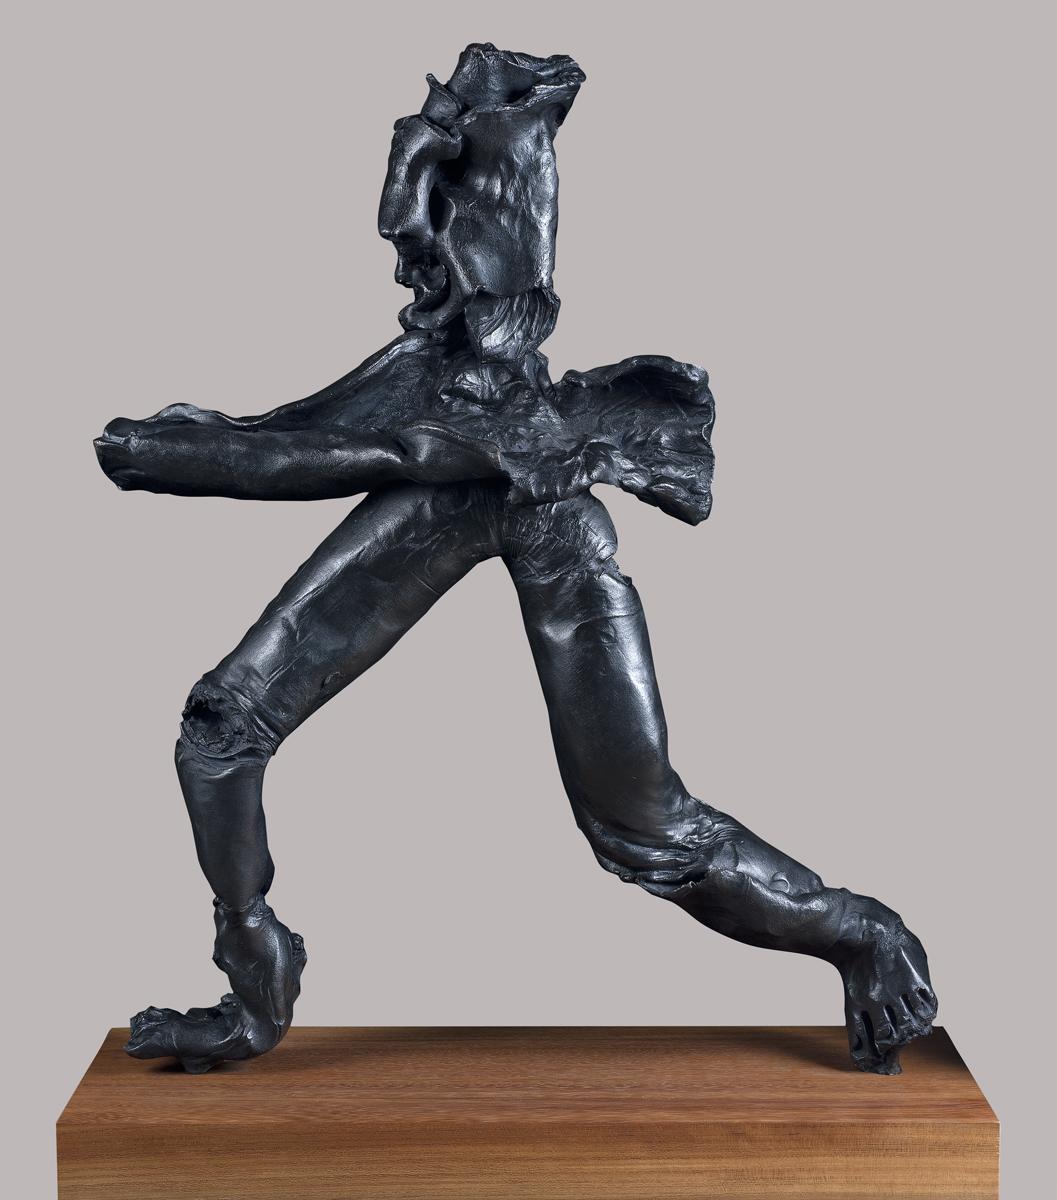 Equilibrist (1/3), bronze, 32 x 26 x 6 inches, 2016